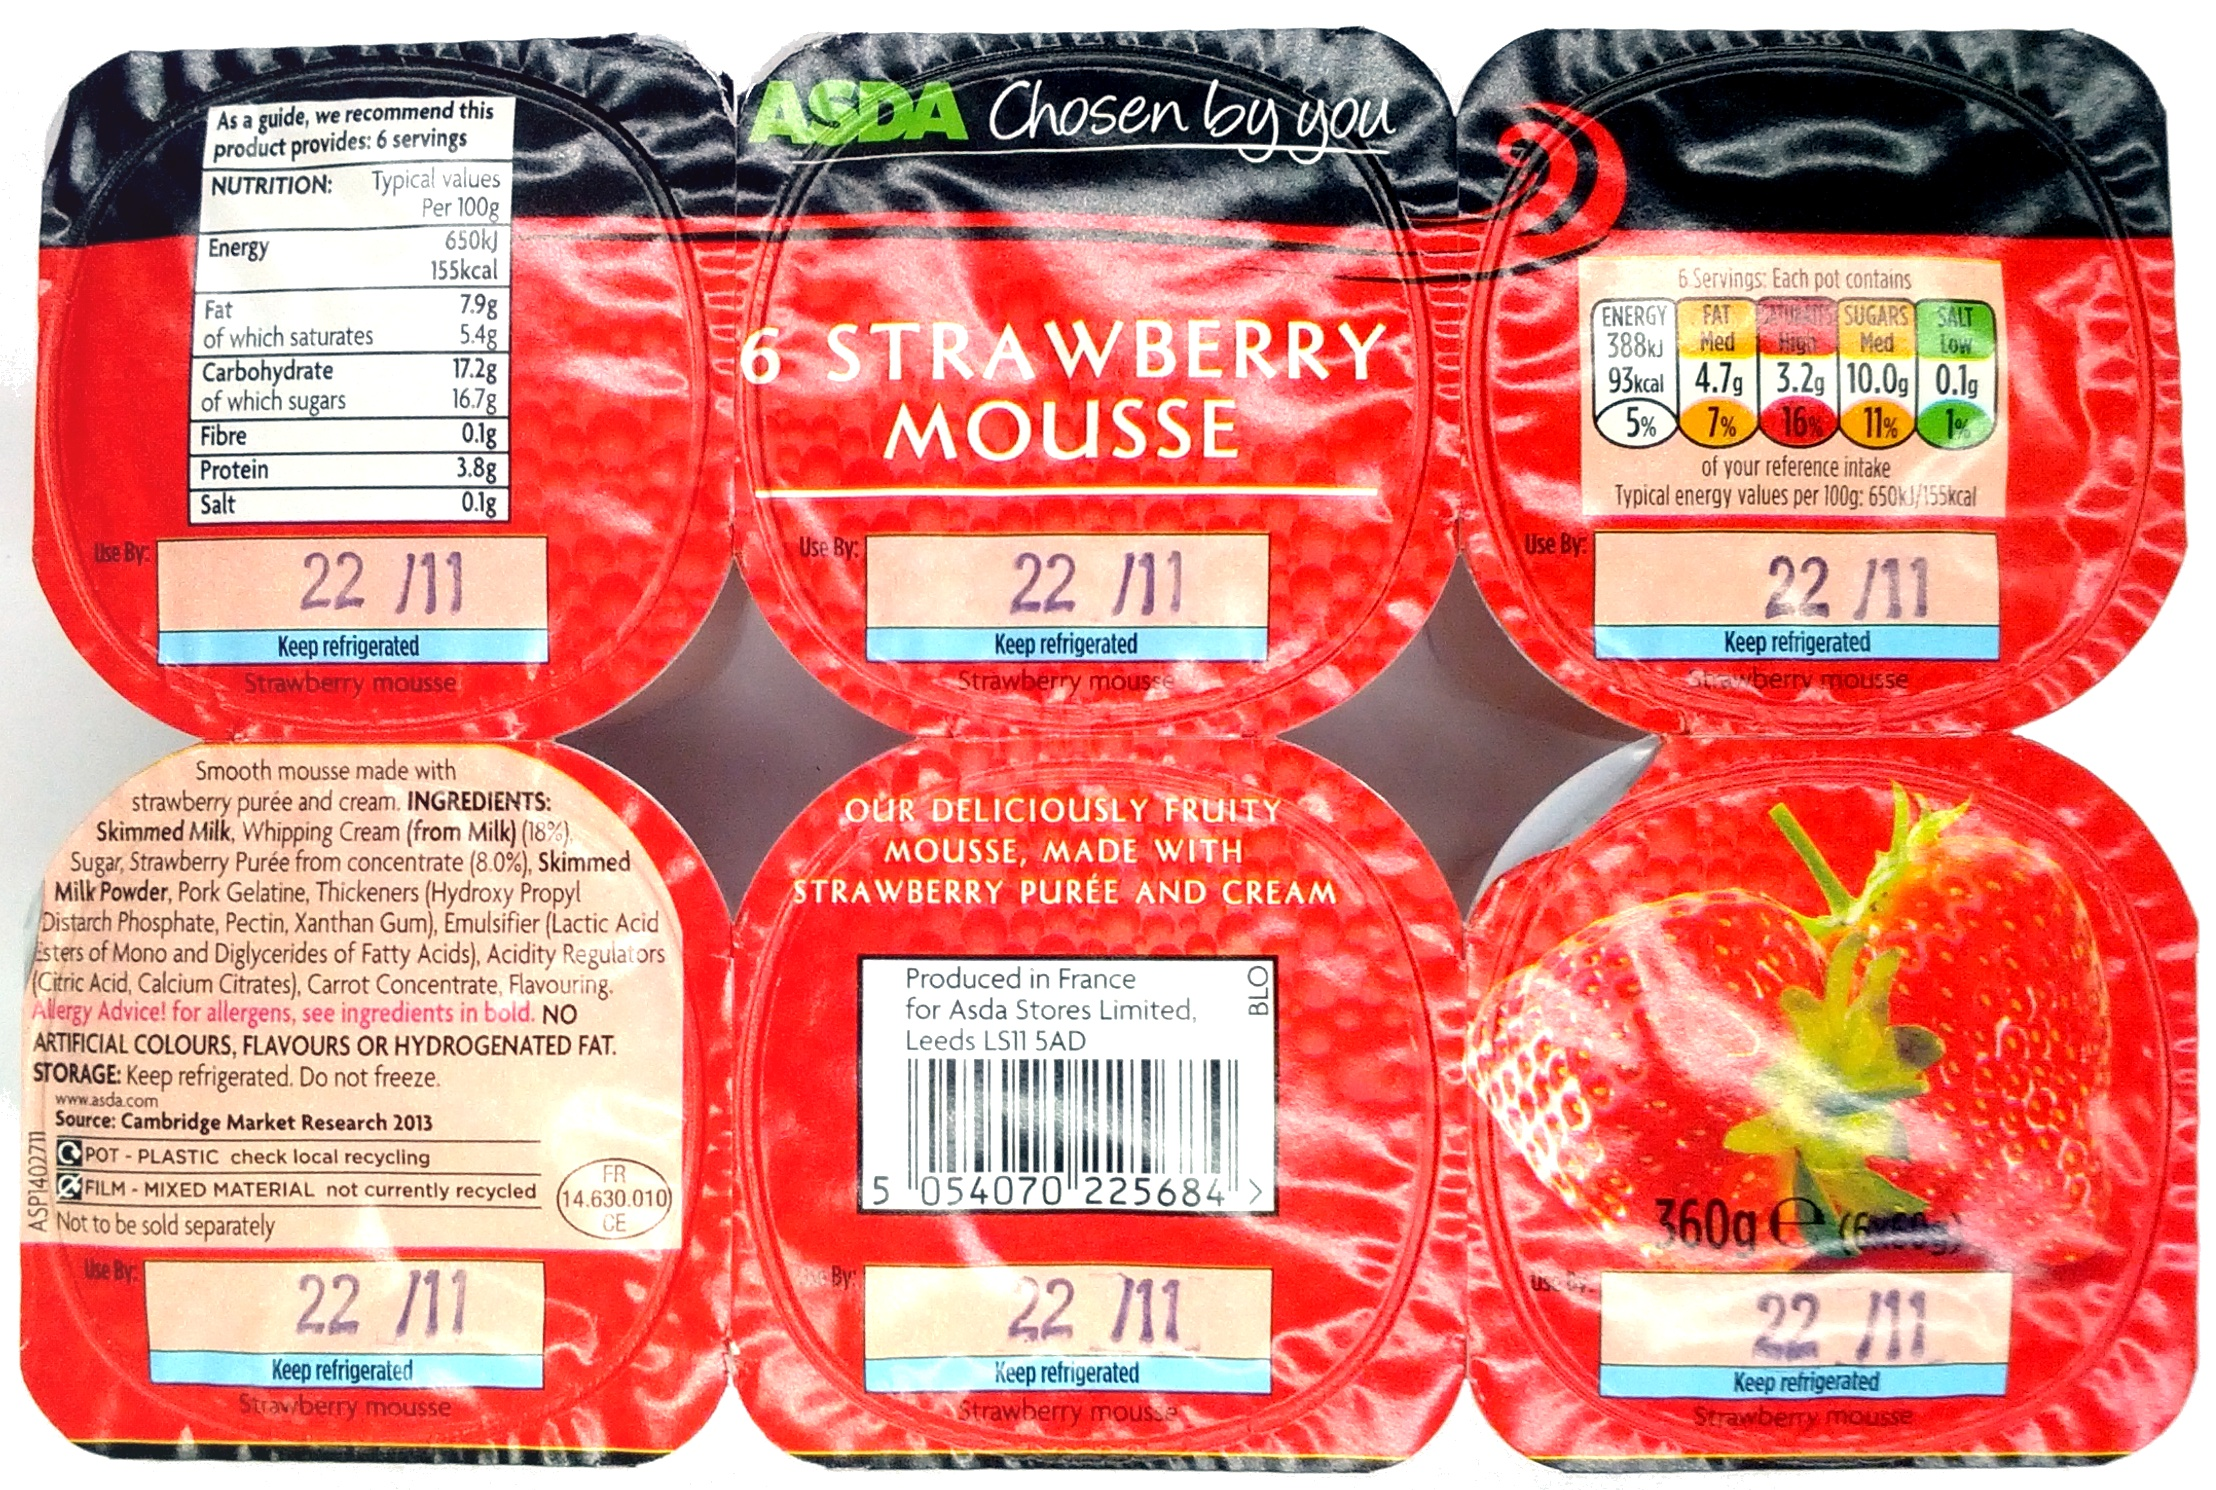 6 Strawberry Mousse - Product - en